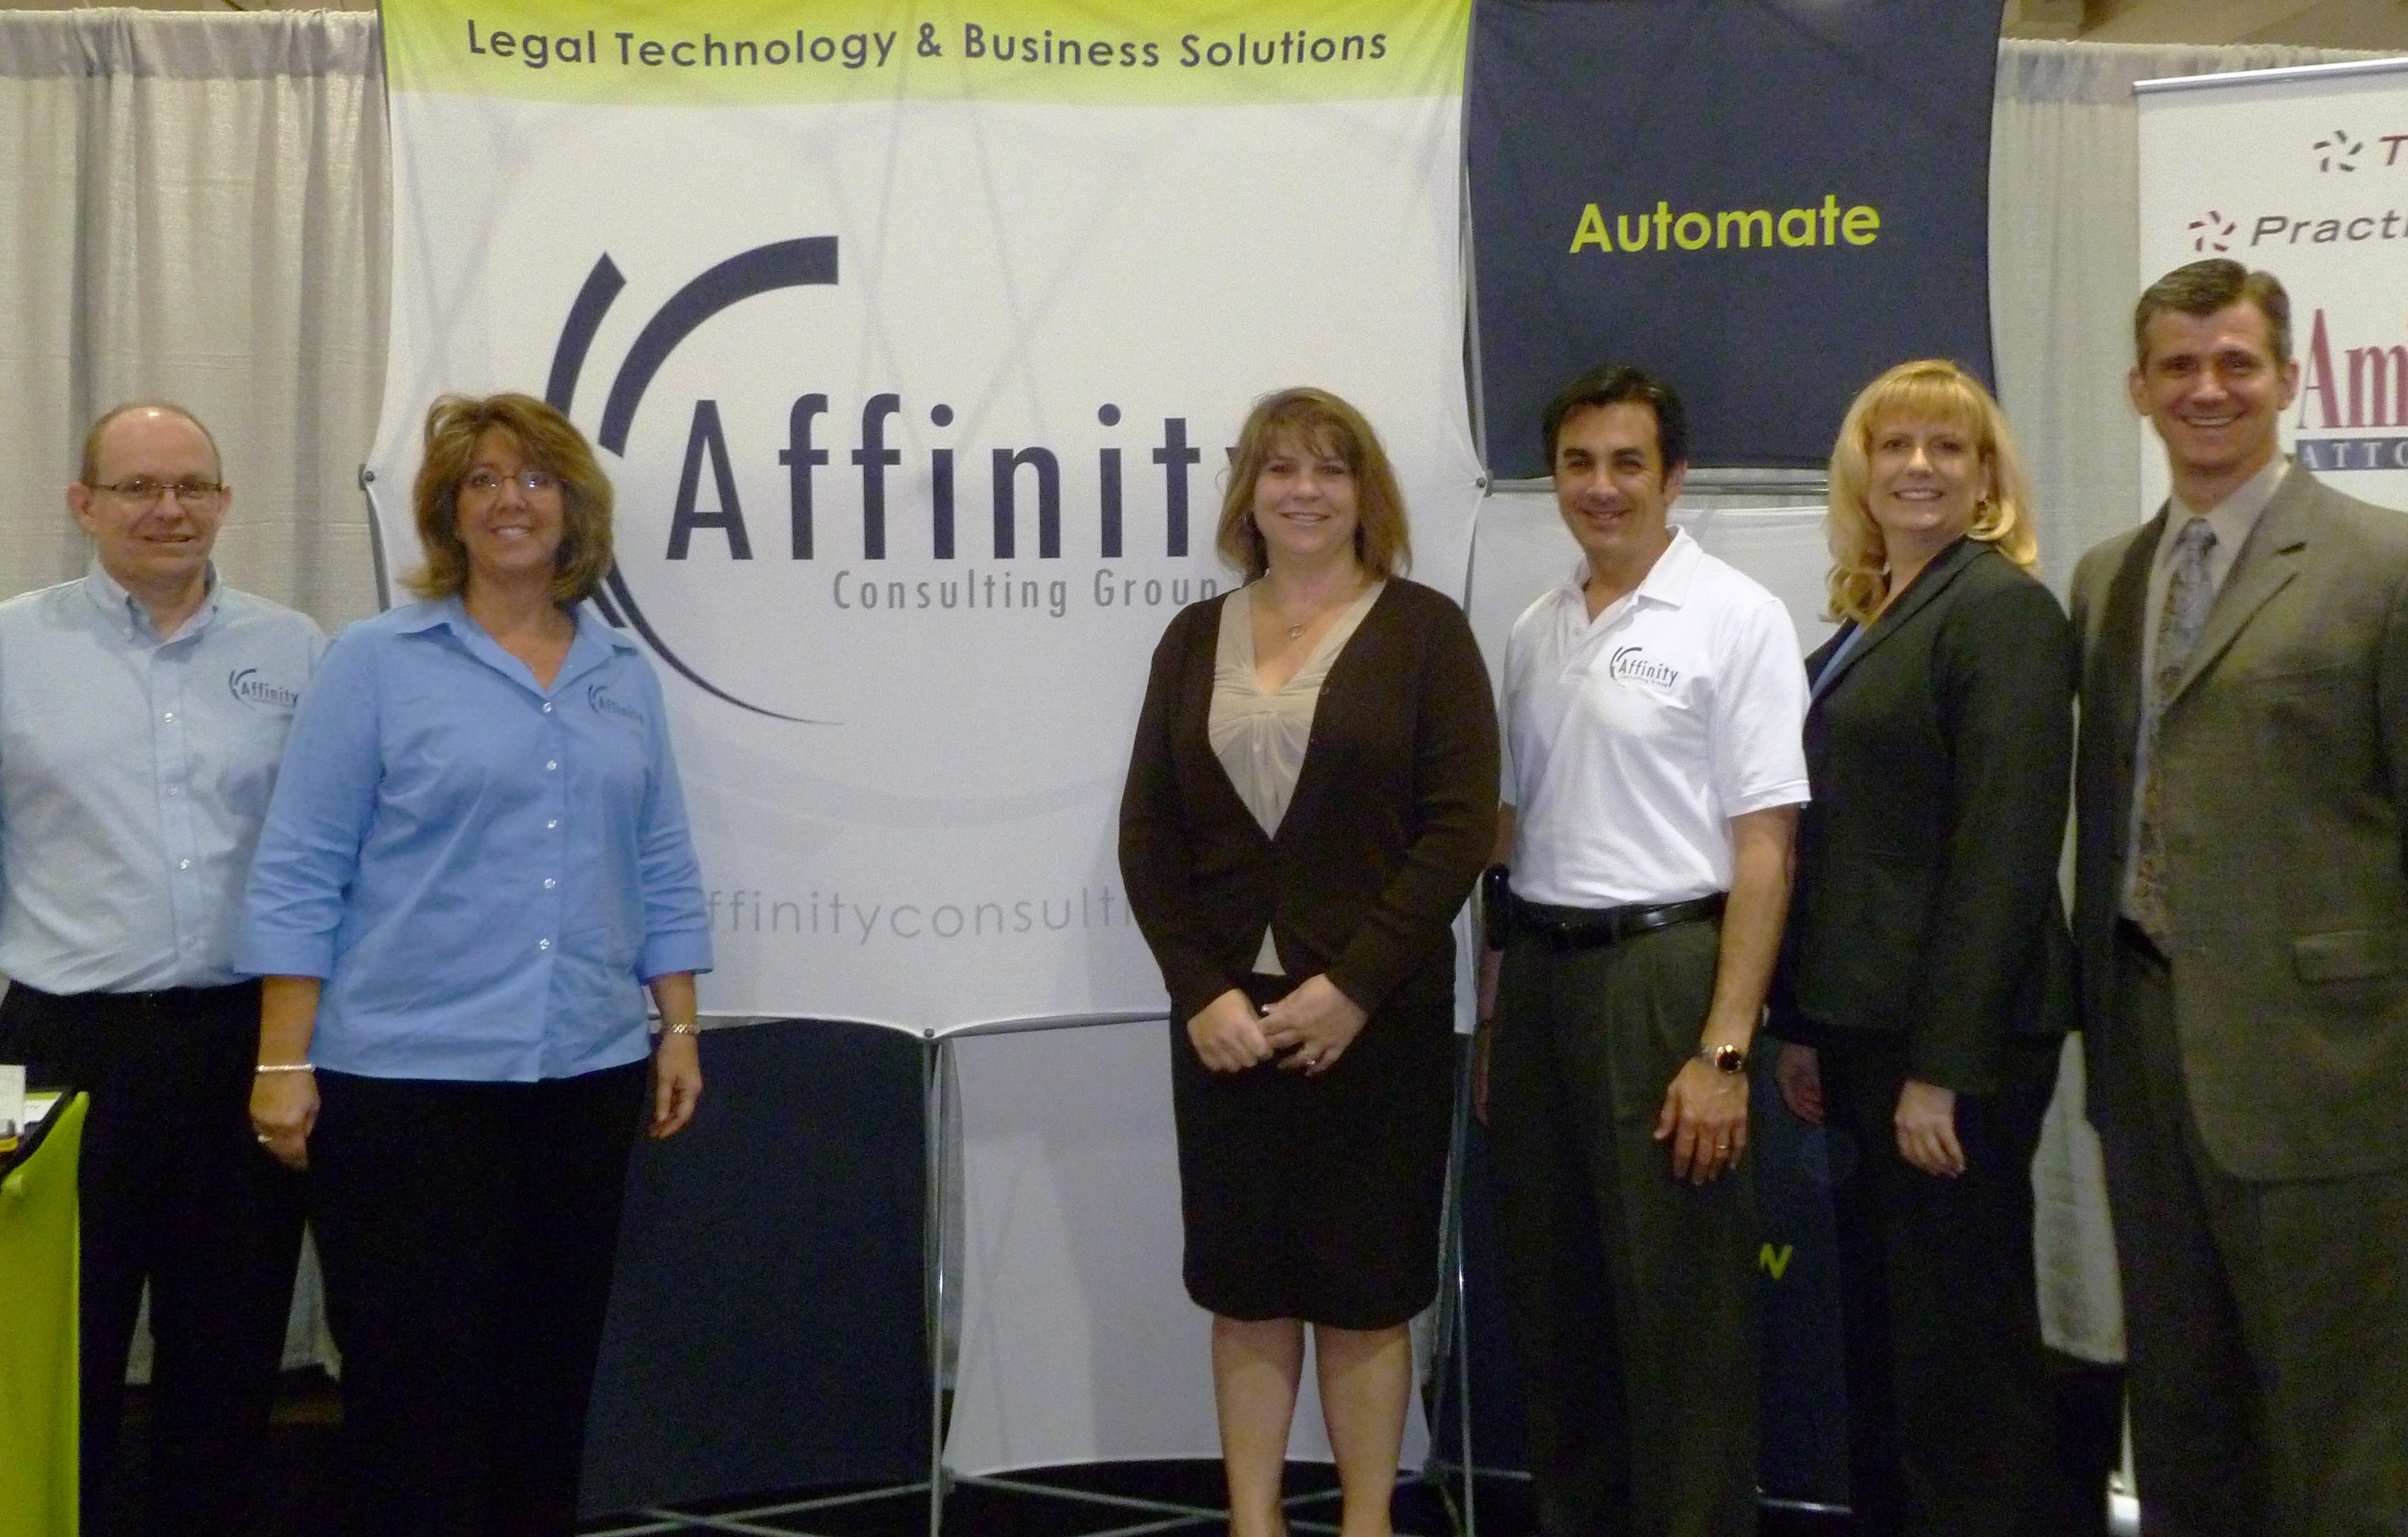 Affinity Consulting - Ed Emmerson, Cindy Emmerson, Debbie Foster, Steve Best, Britt Lorish Knuttgen, Barron Henley